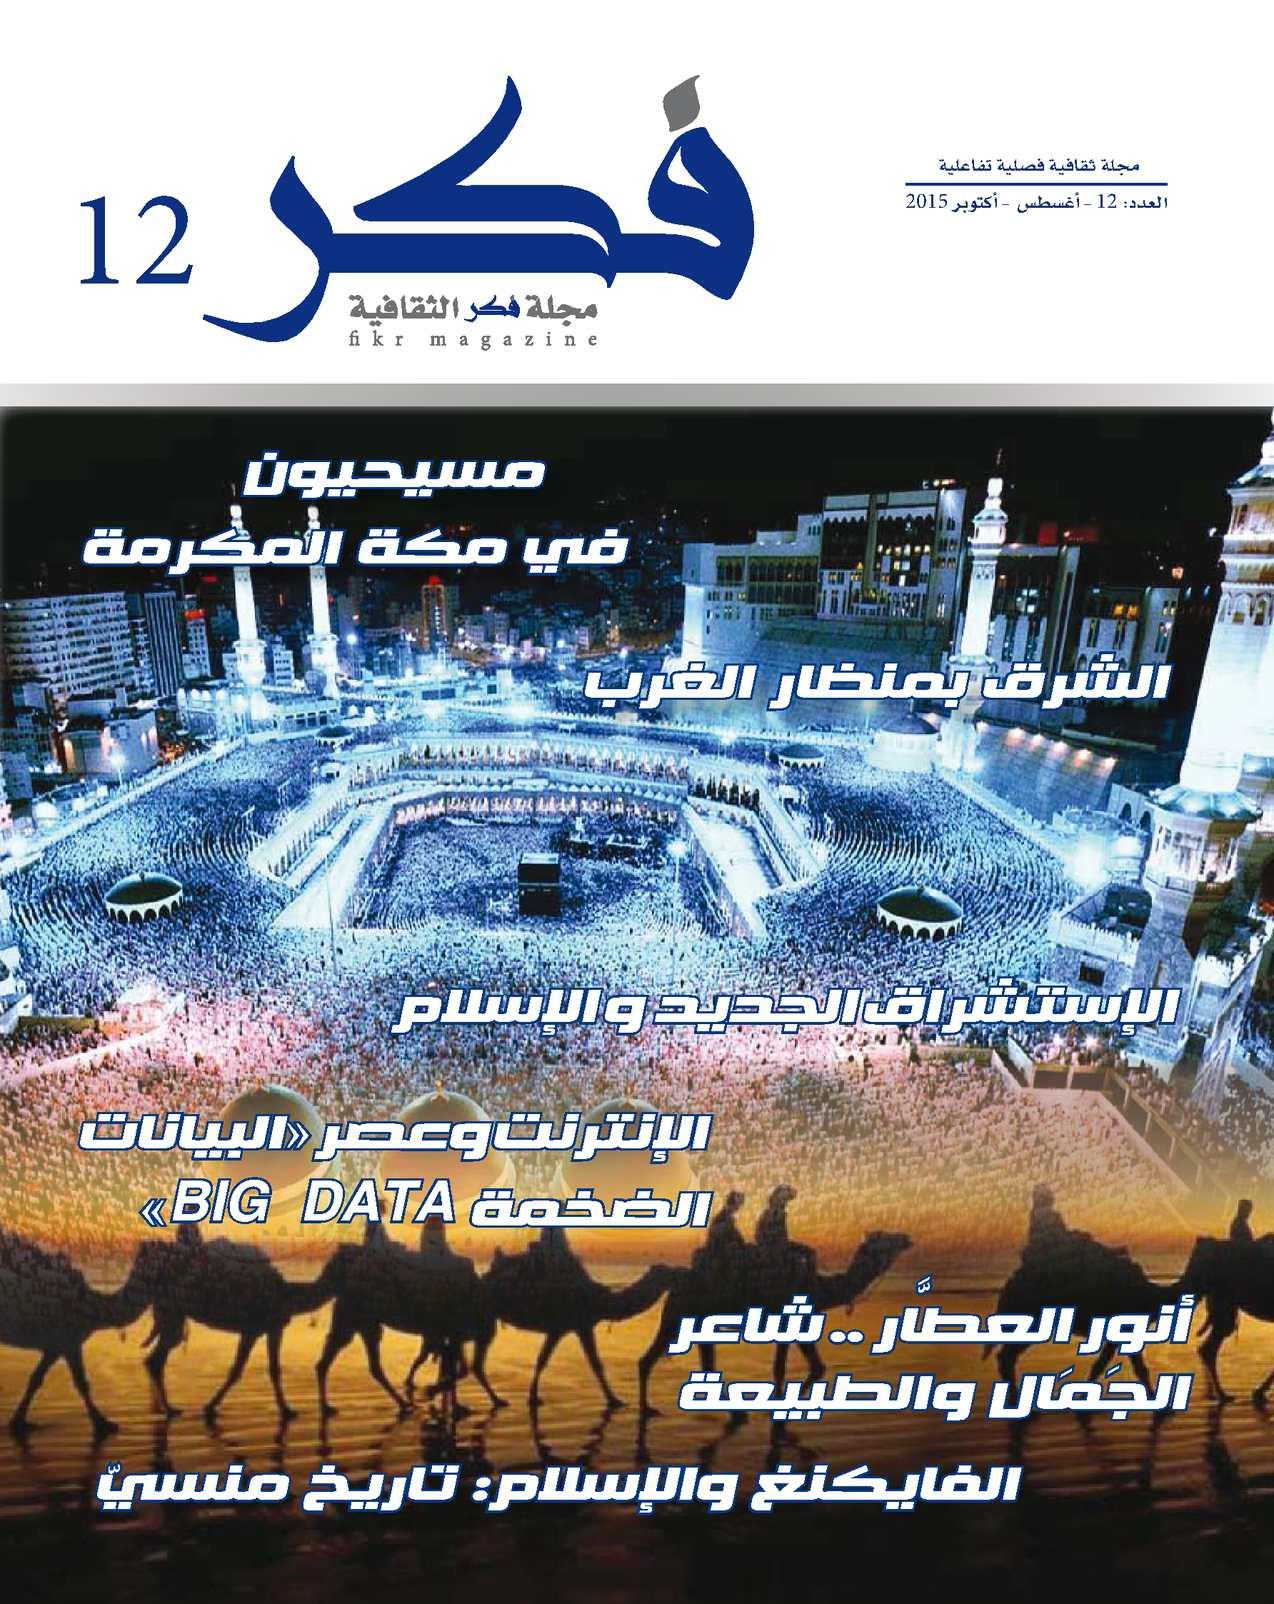 076e62e18 Calaméo - Fikr Magazine 12